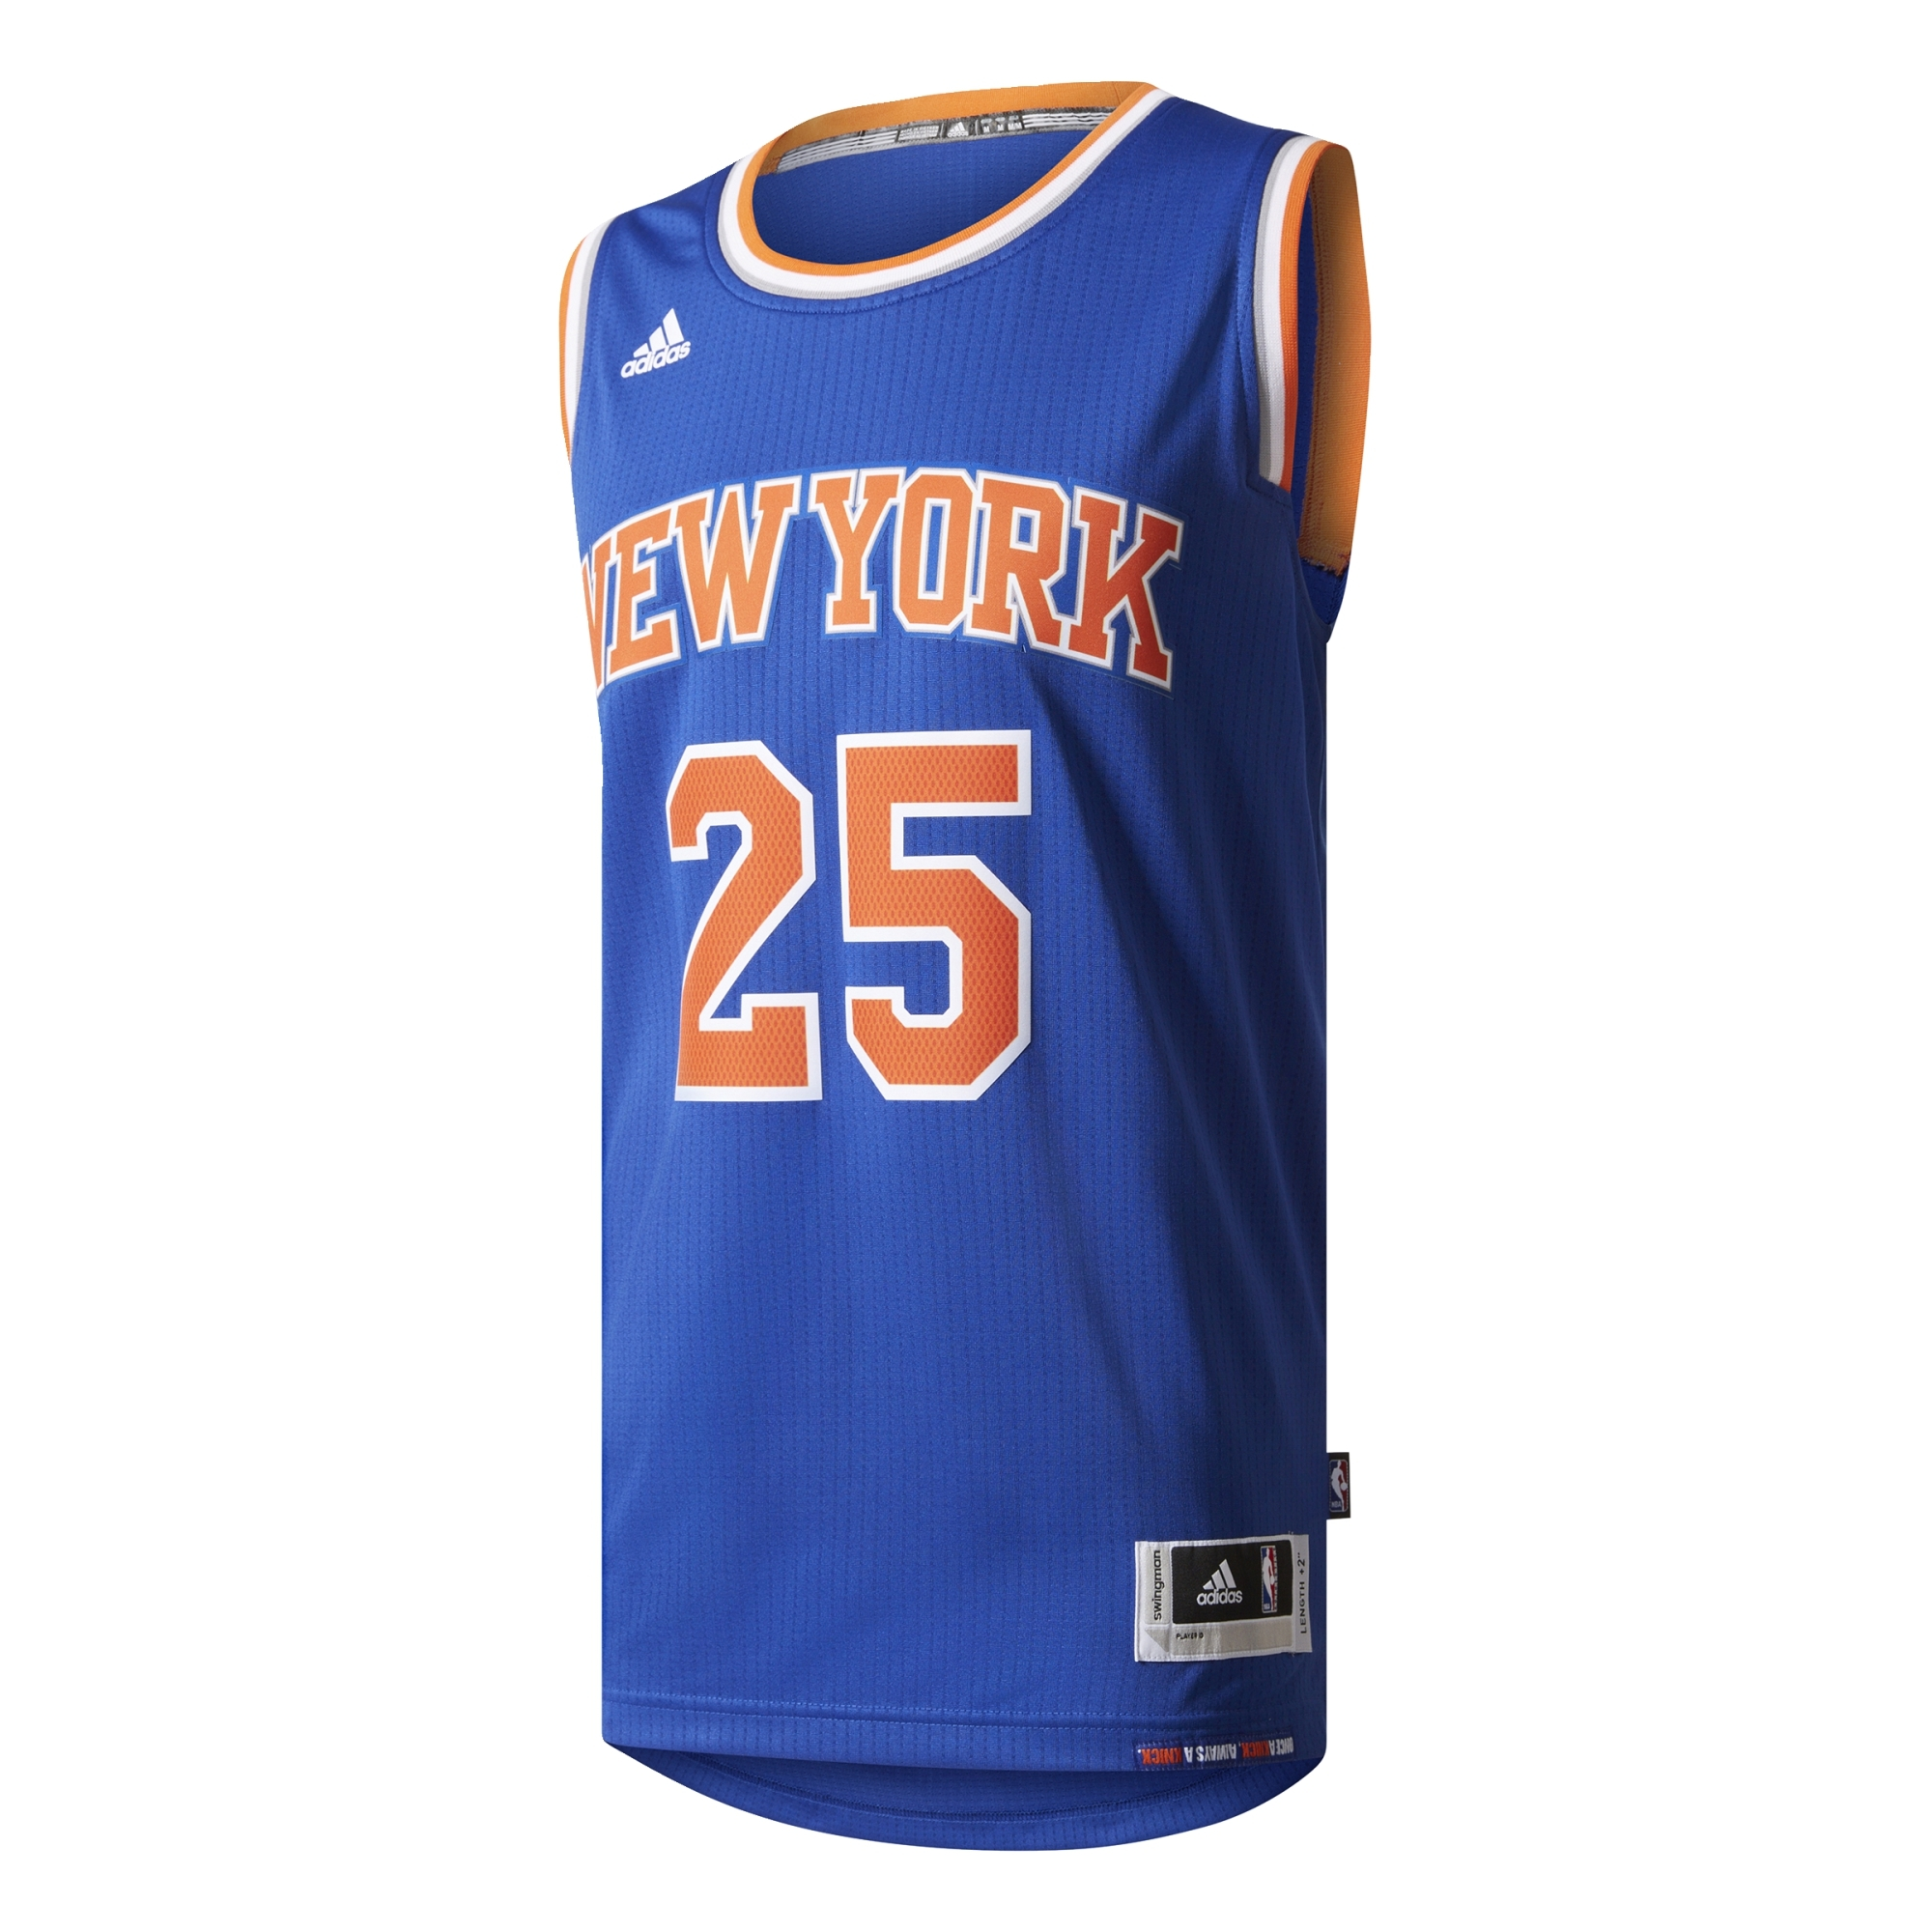 Adidas NBA Swingman New York Knicks Rose  25 (nba-nyk5) f888b8edafd12